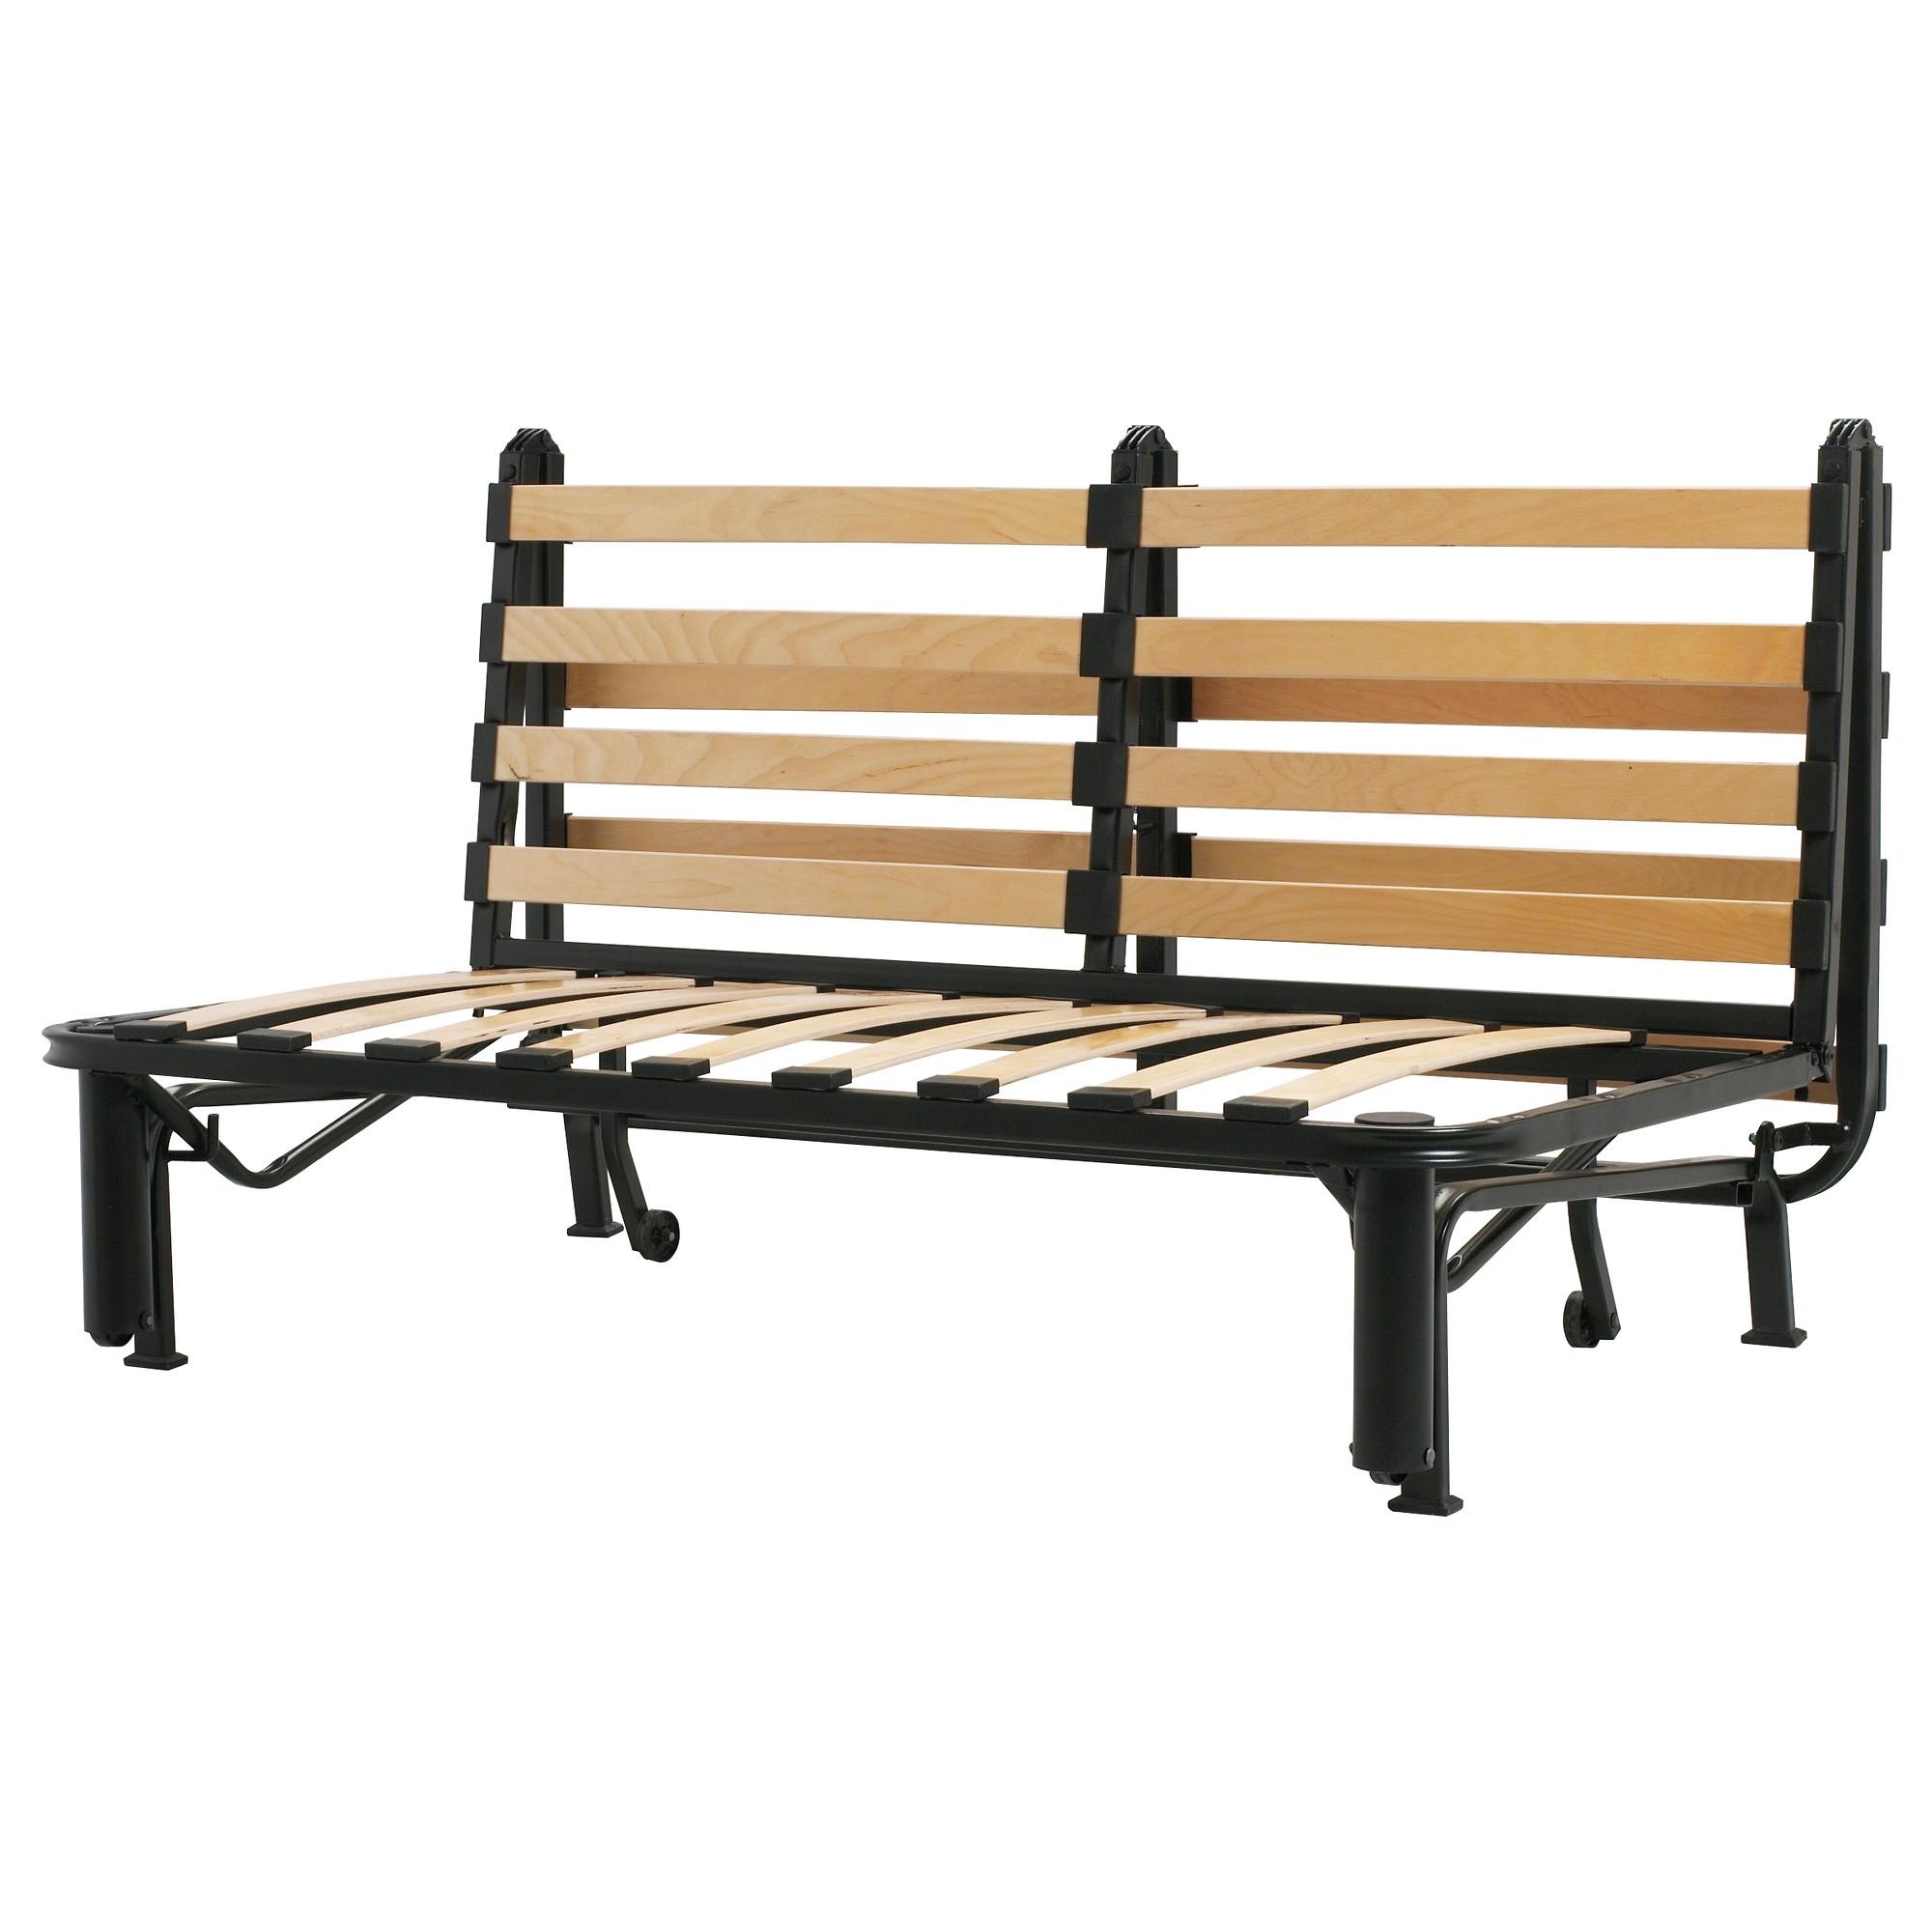 Ikea tenerife detalles producto for Sillon cama amazon